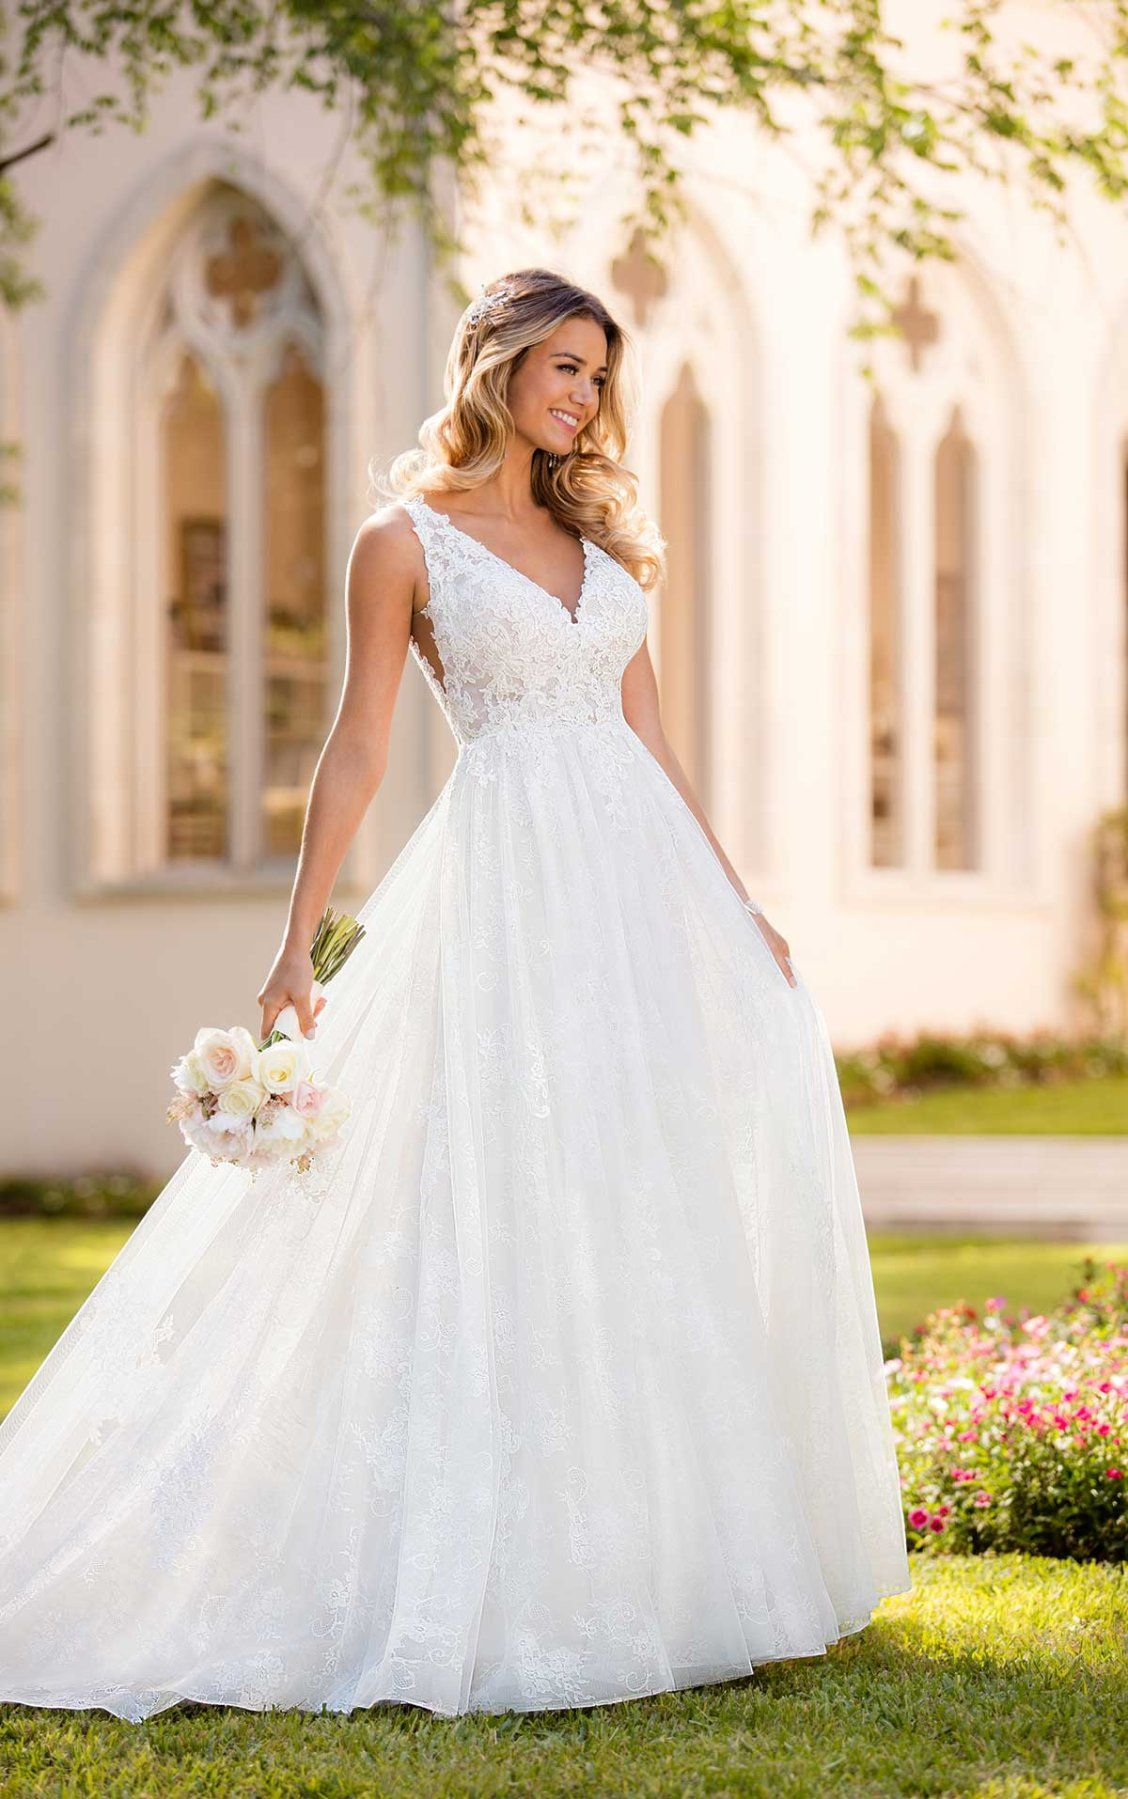 Boho wedding dress with floral lace stella york wedding dress and